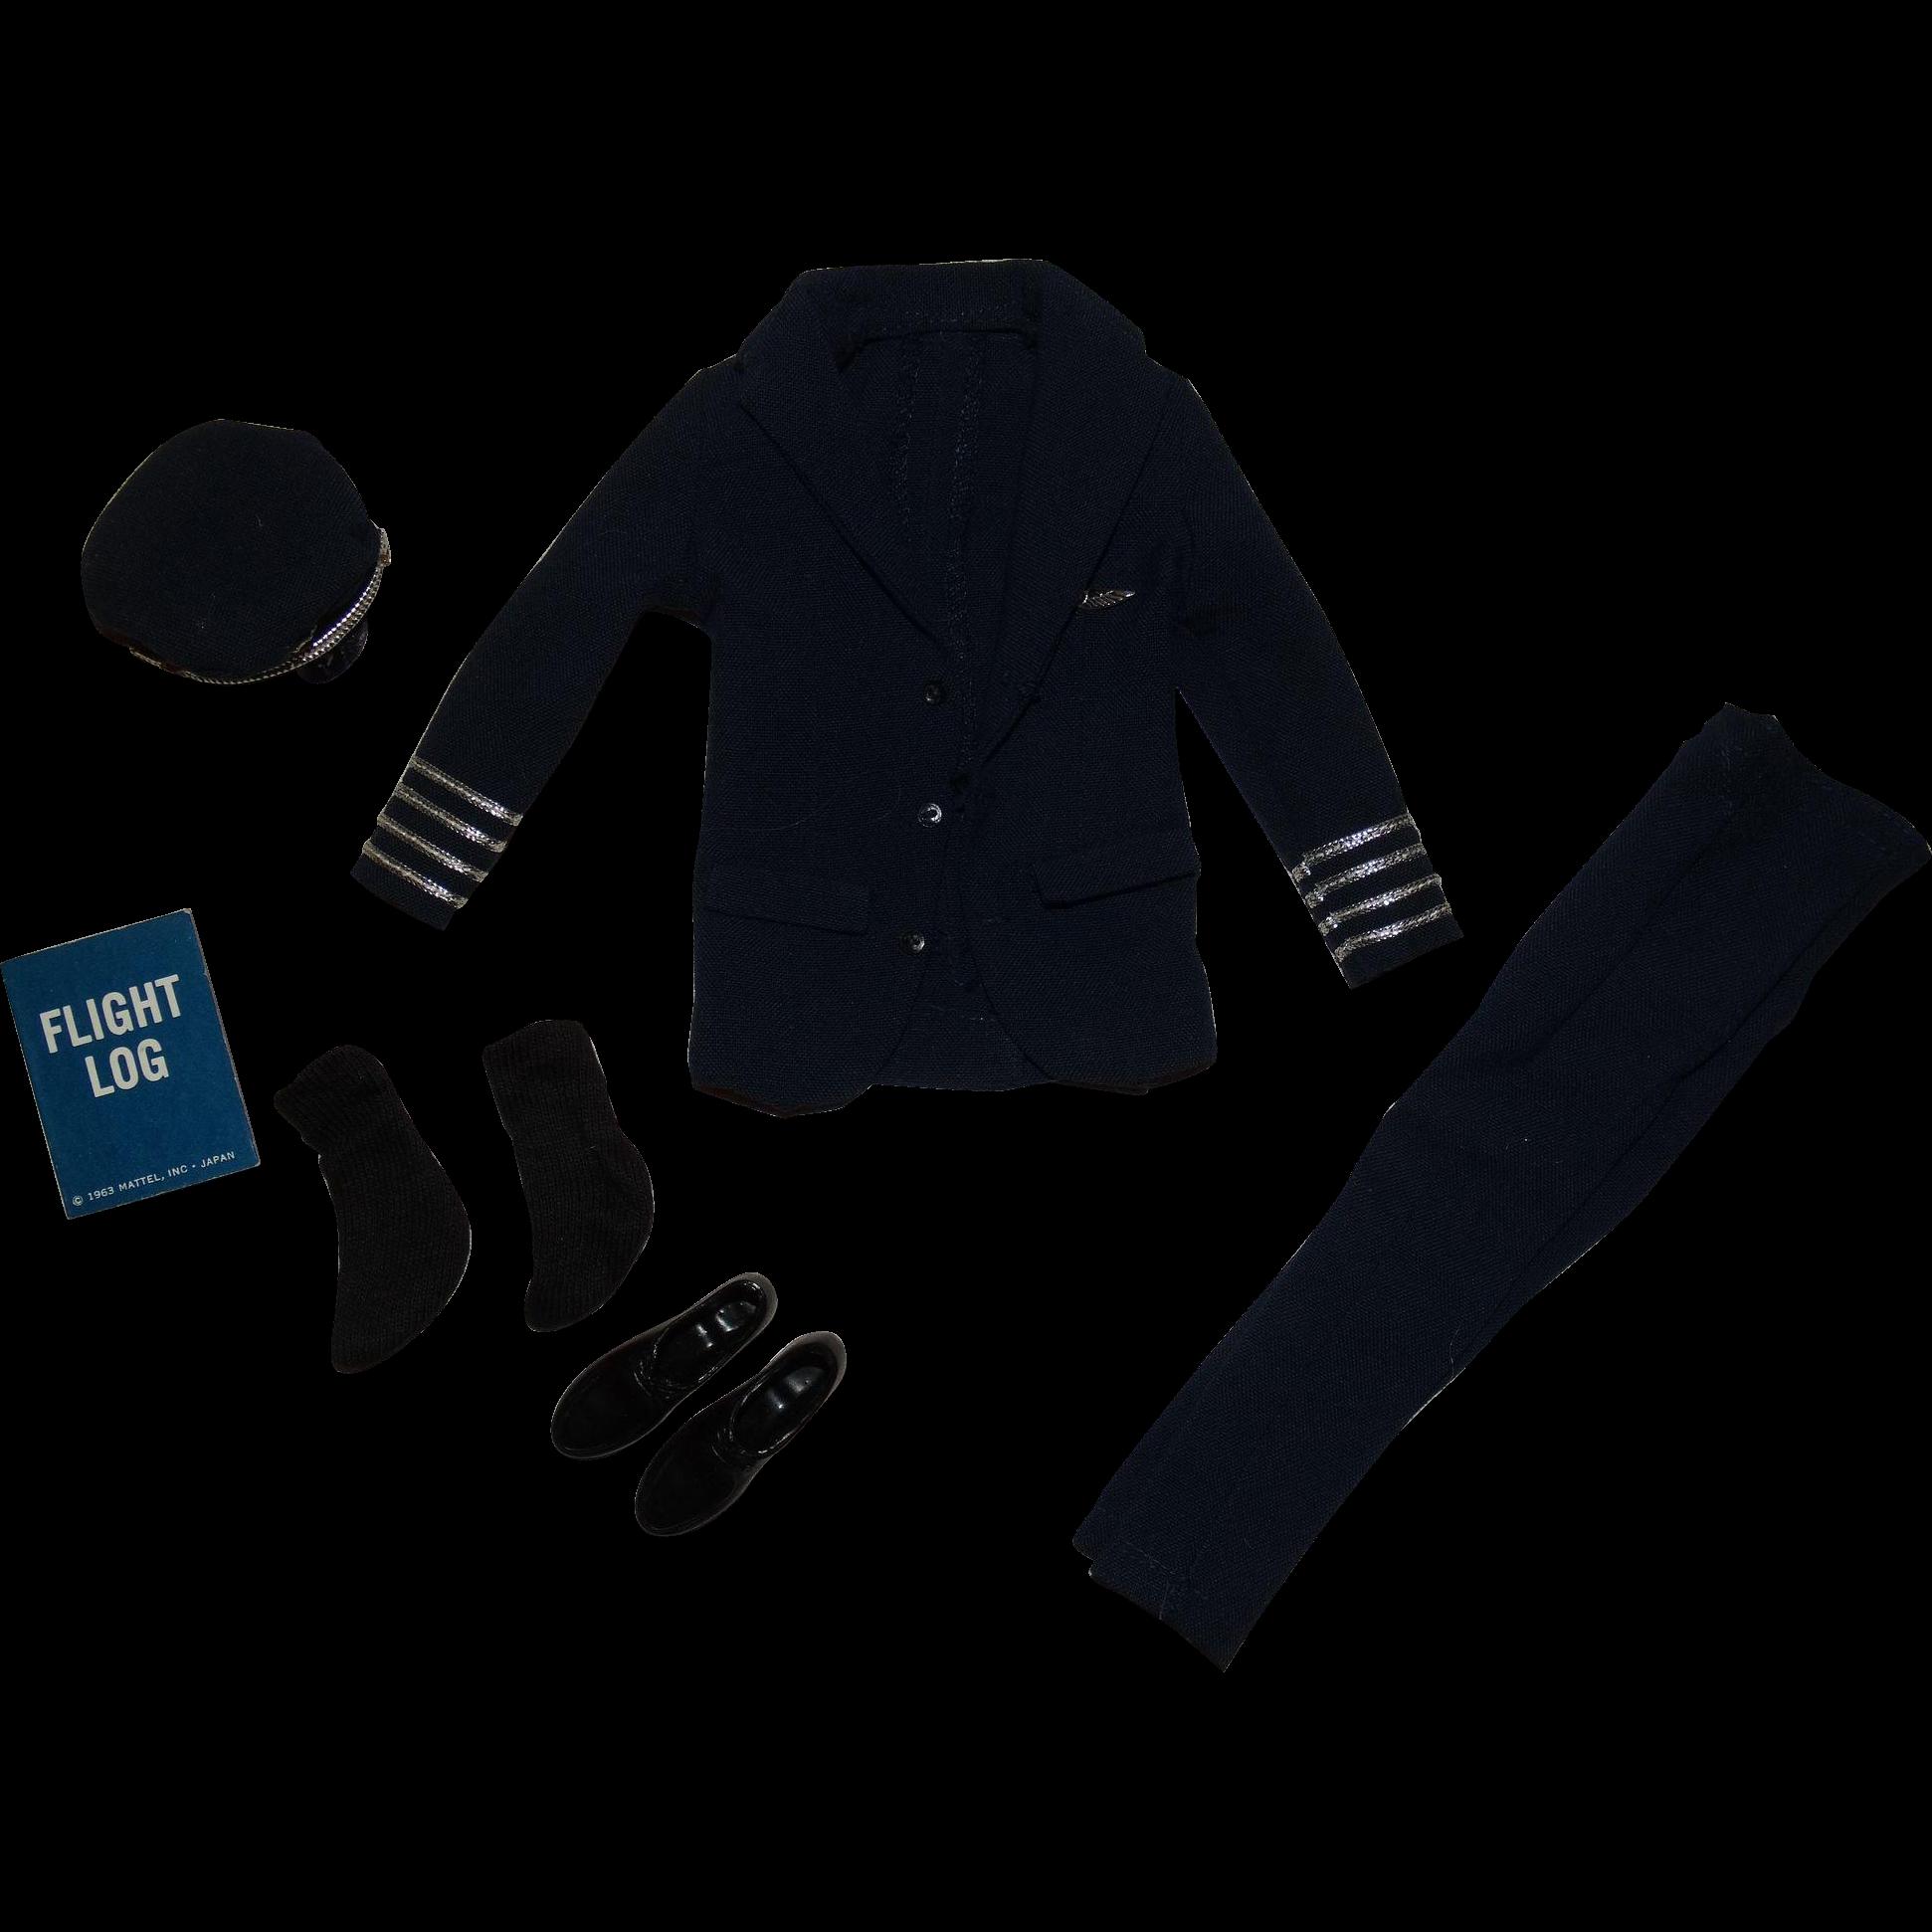 Vintage Ken 1964 American Airlines Pilot Outfit